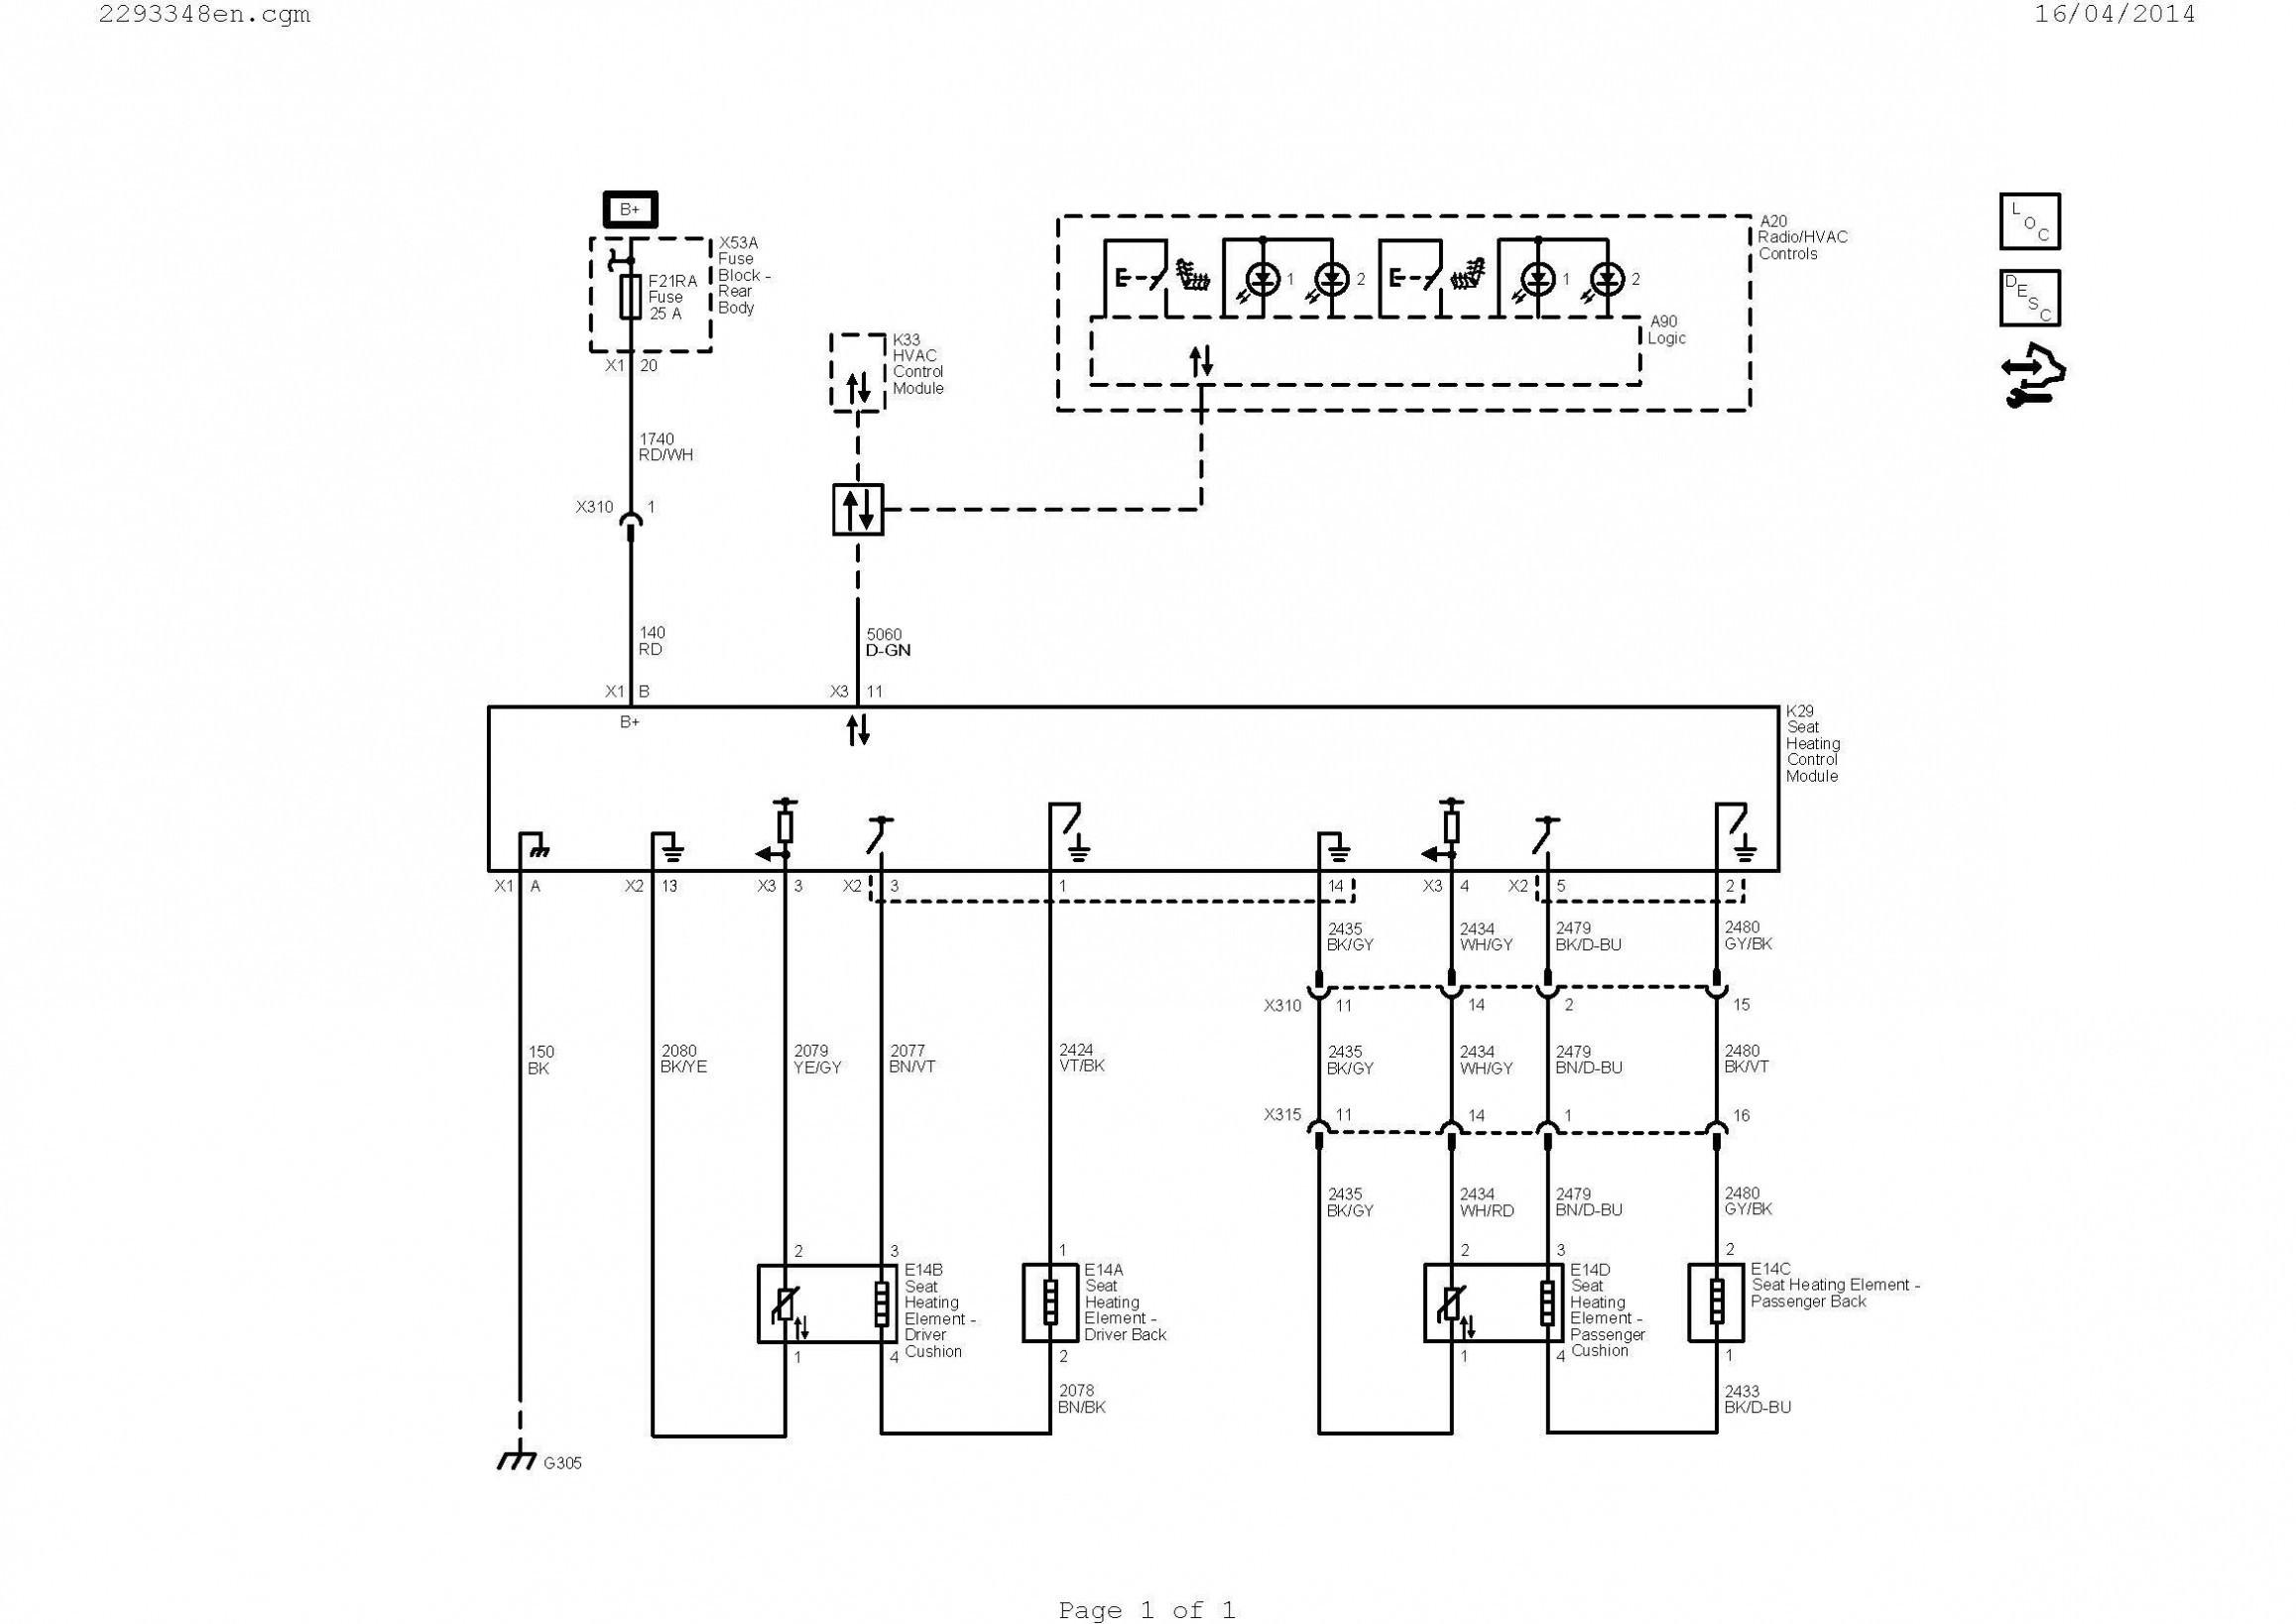 Car Powertrain Diagram Chevy Ignition System Wiring Diagram Save top Car Brake Diagram Rear Of Car Powertrain Diagram